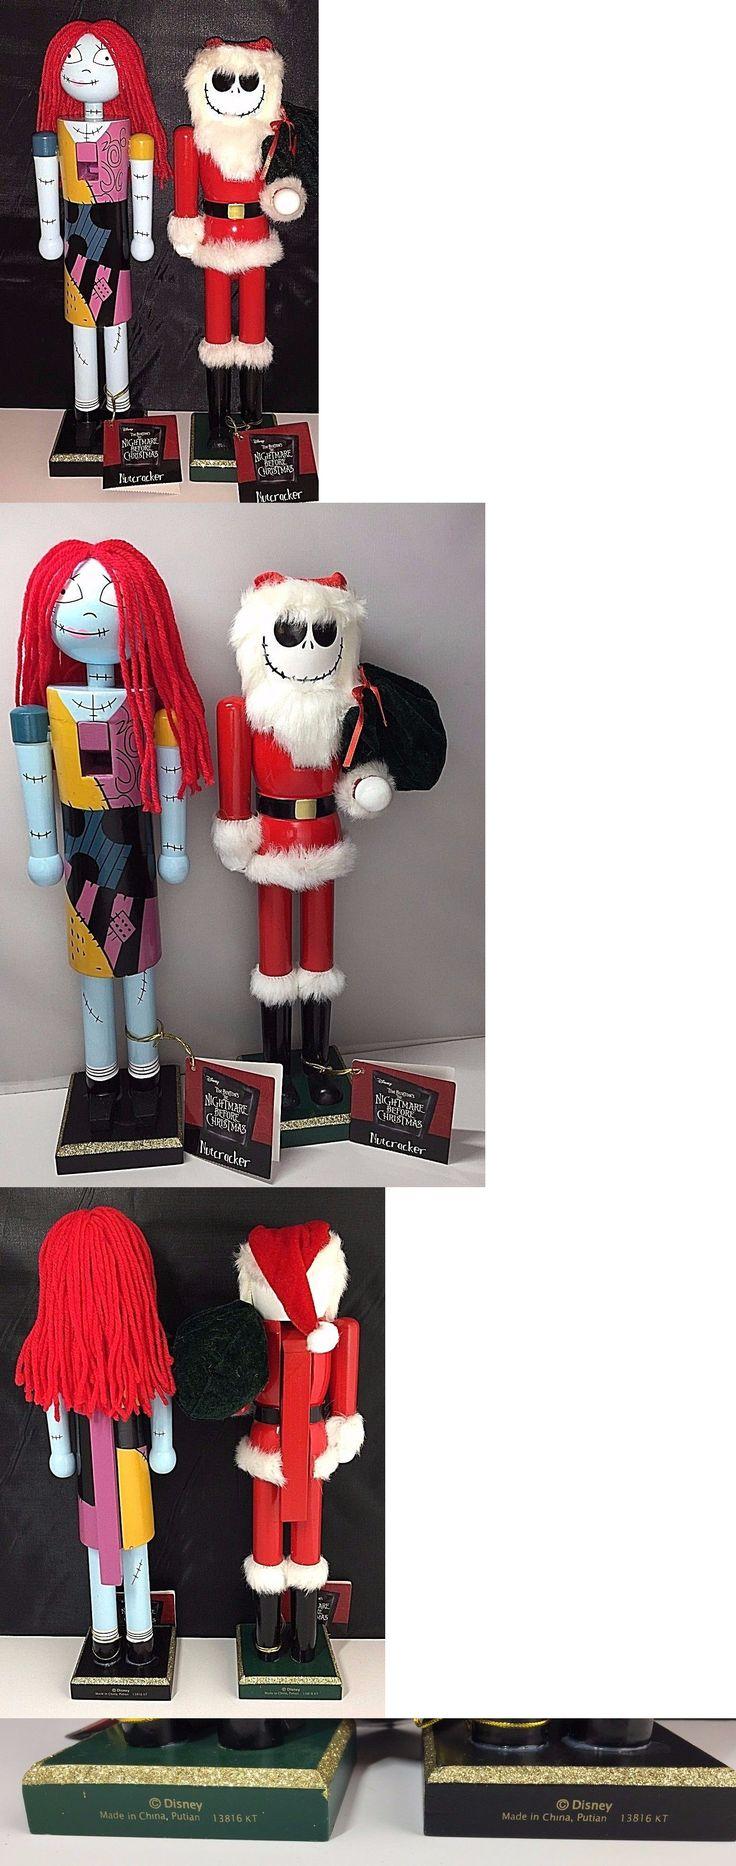 nightmare before christmas nutcrackers pictures - Nightmare Before Christmas Nutcracker